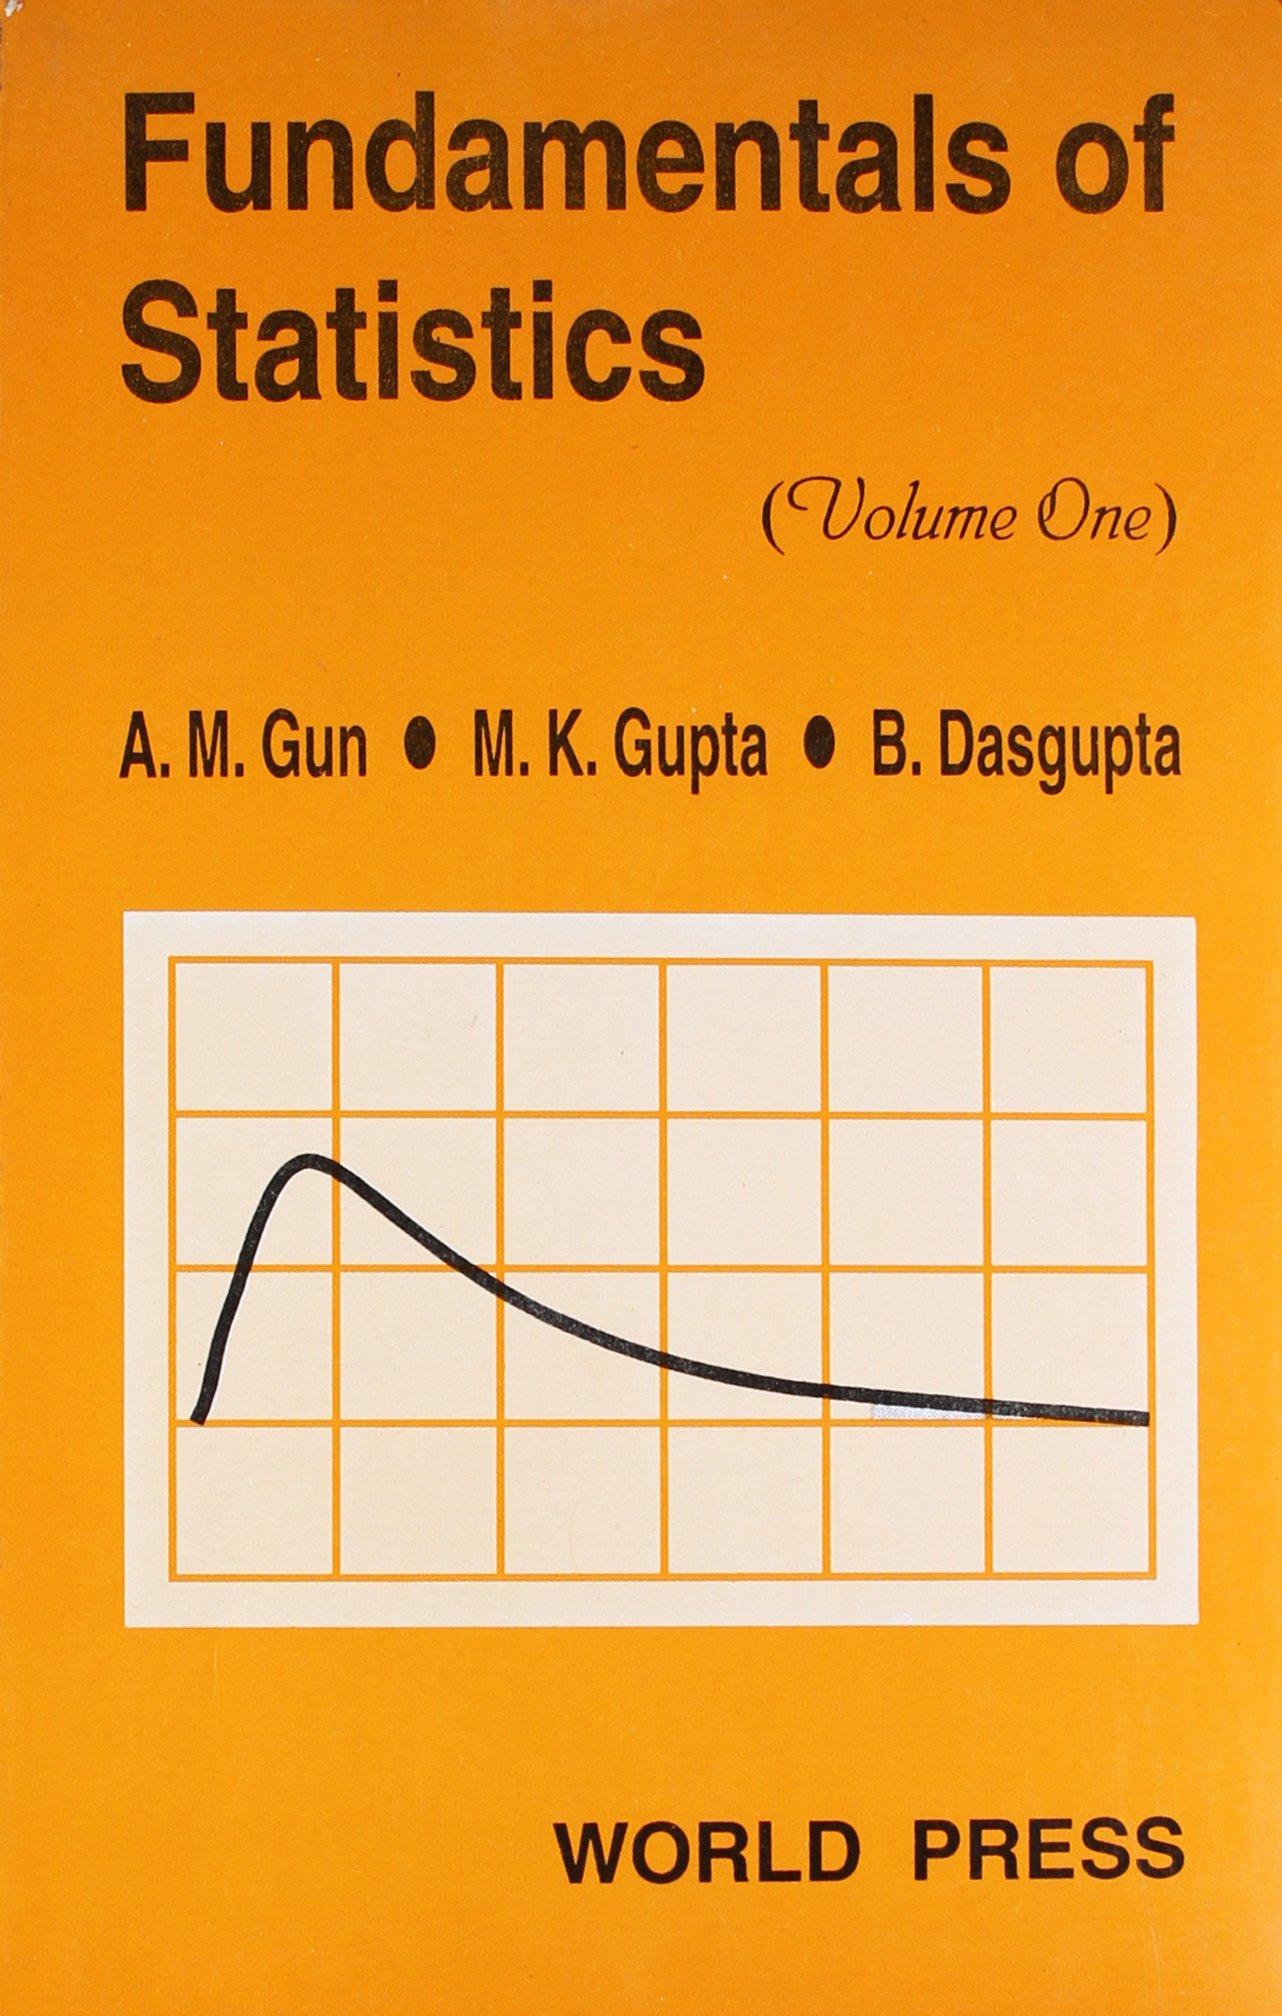 fundamentals of statistics pdf free download